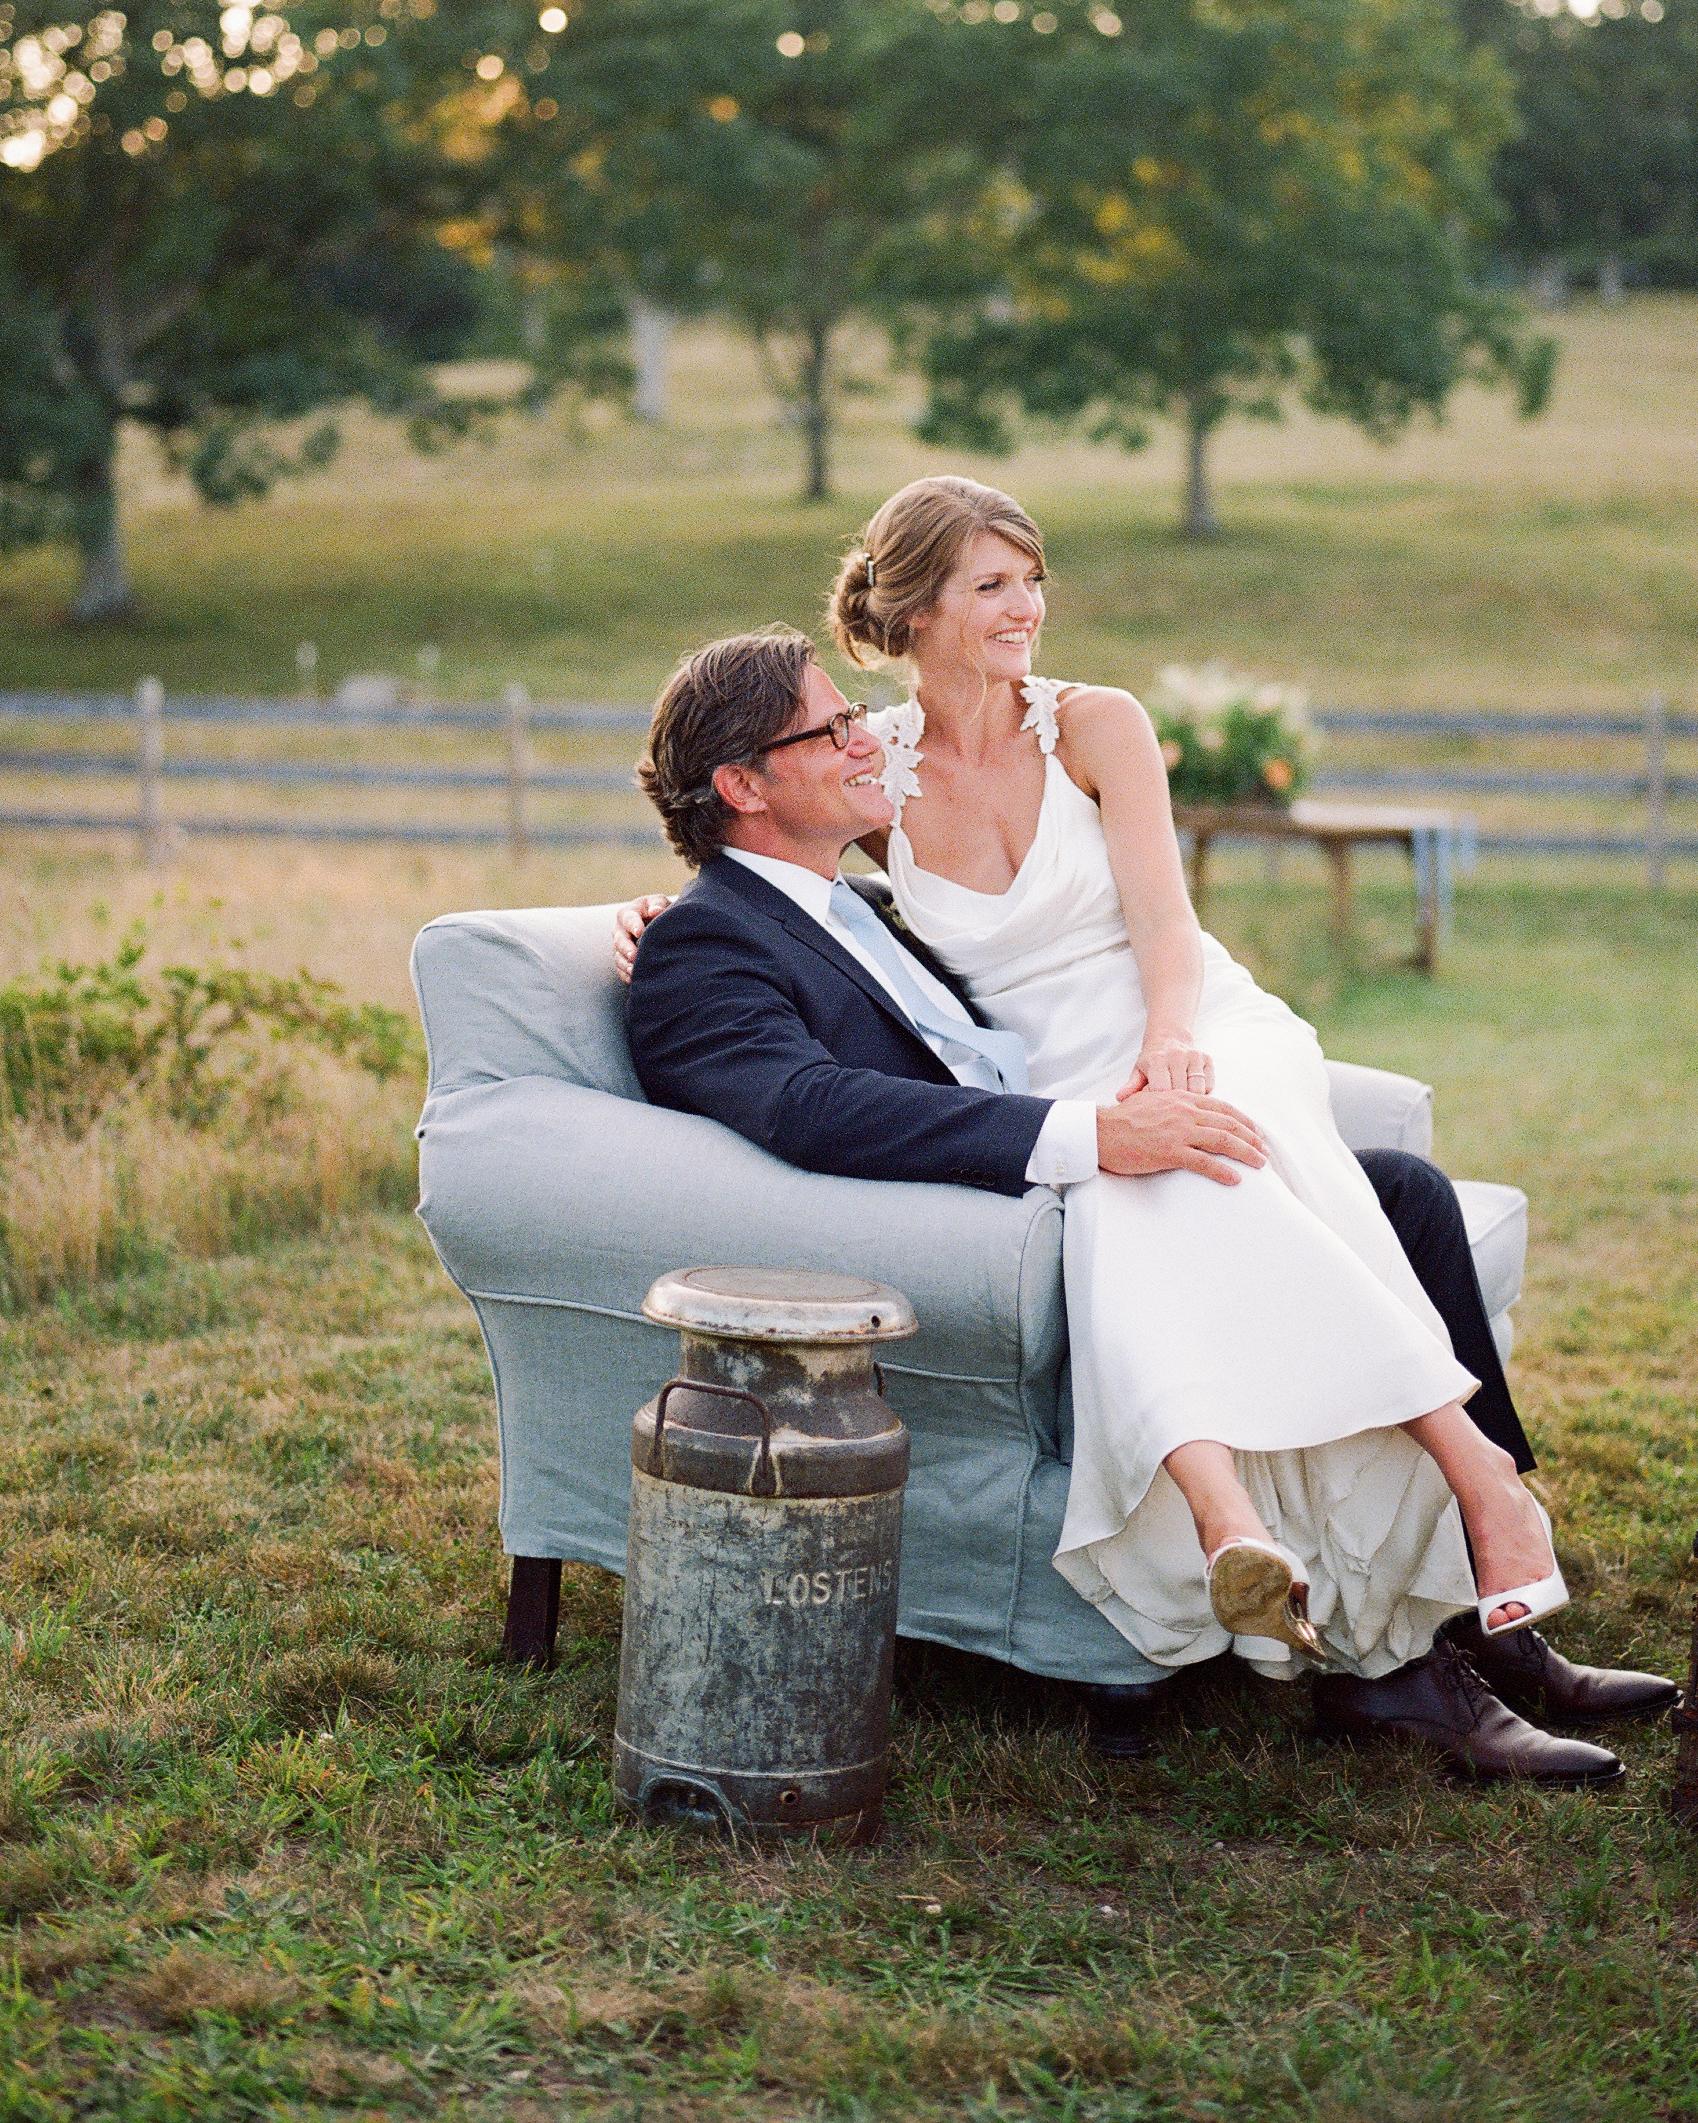 jocelyn-graham-wedding-couple-1351-s111847-0315.jpg